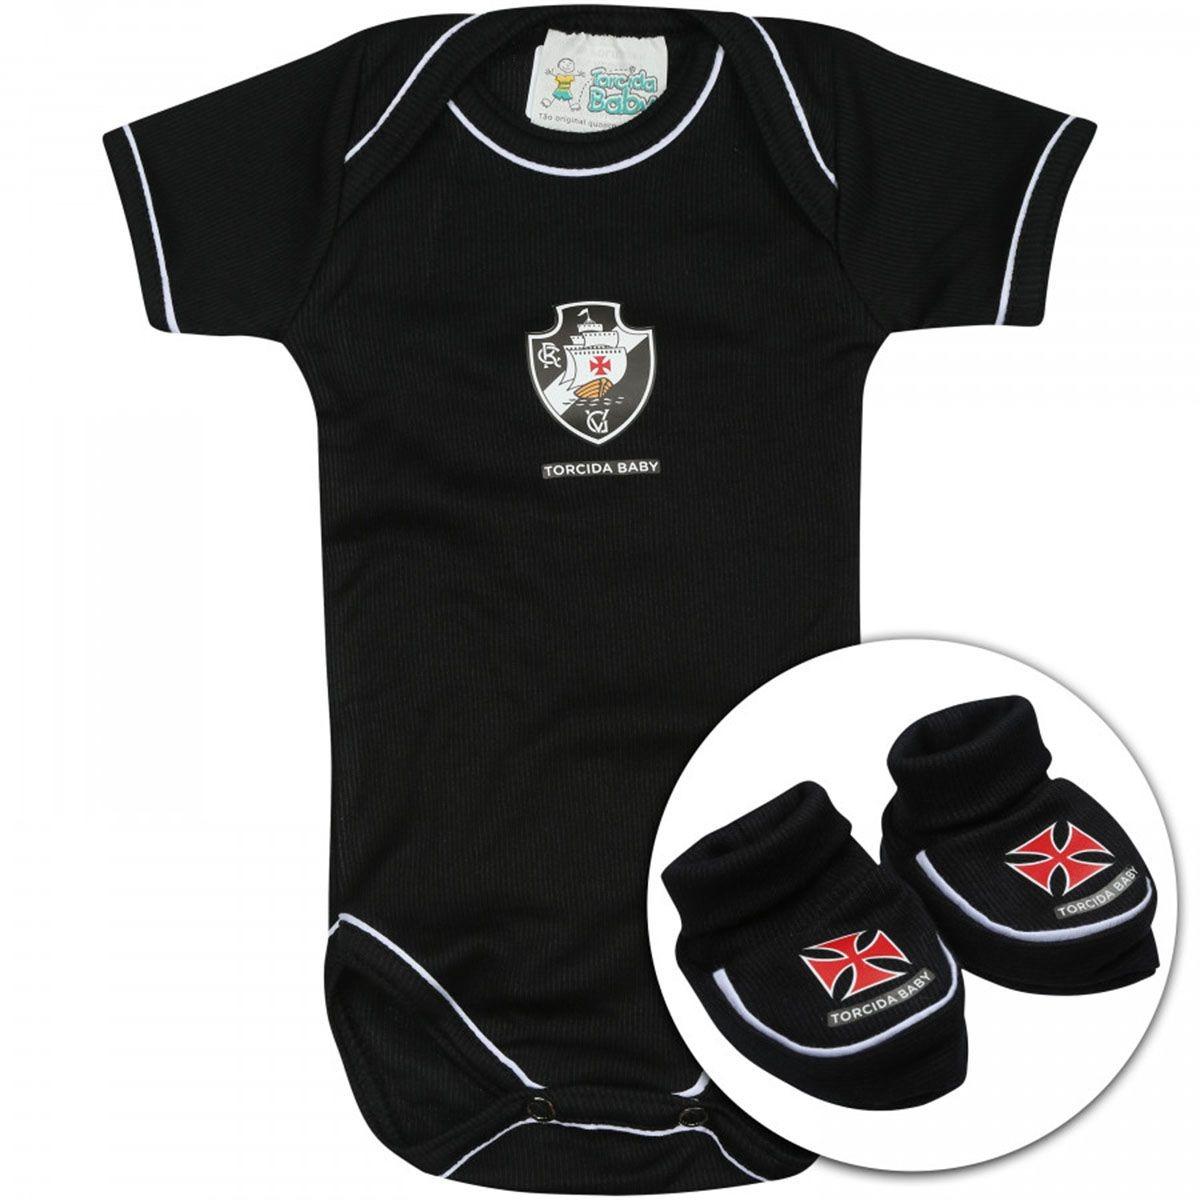 Kit Bebê Torcida Baby Vasco Curto Body+ Pantufa Frete Grátis - R ... 1ba67abac5047